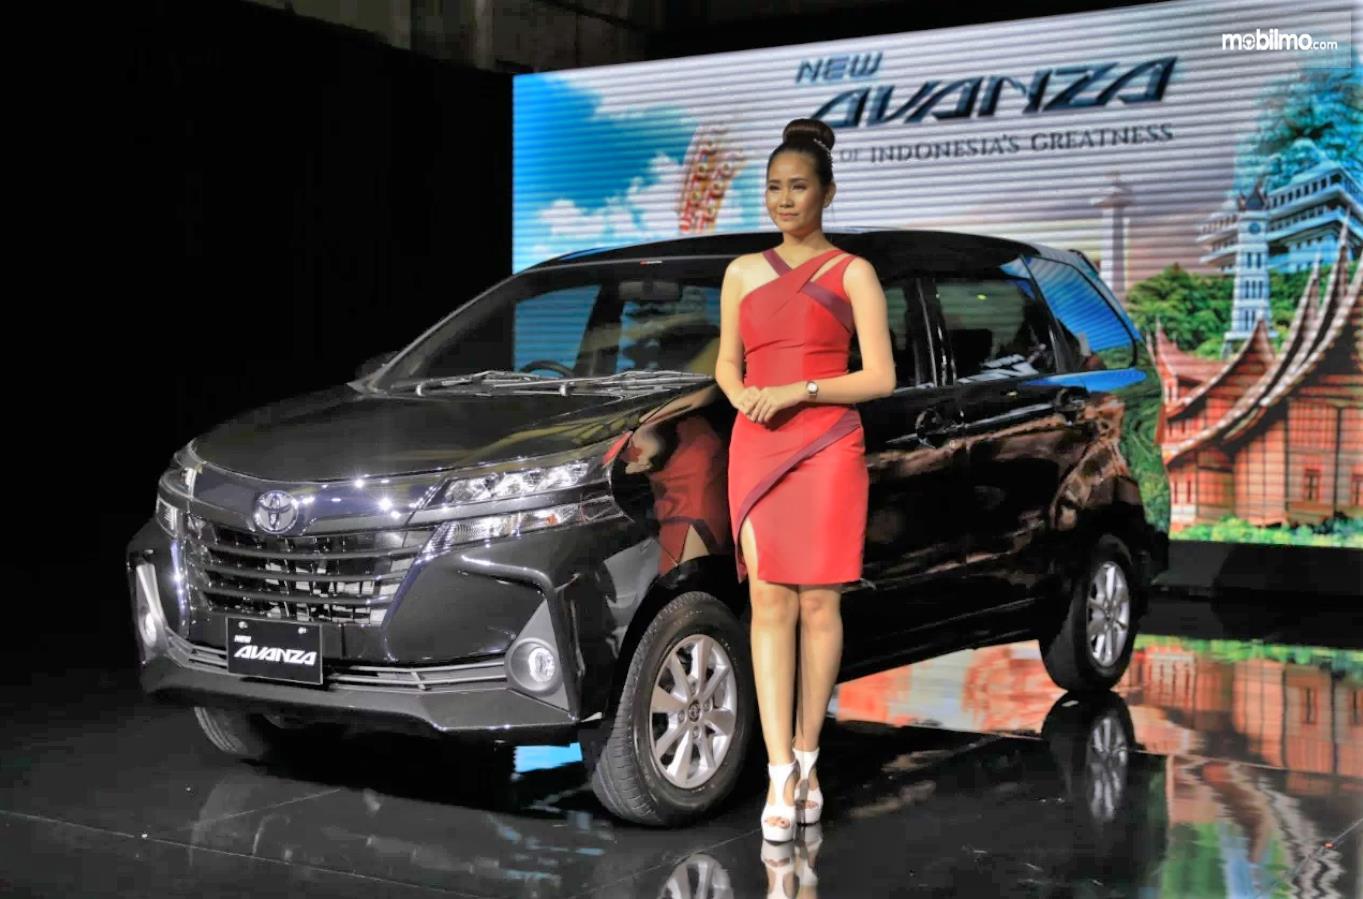 Model berpose bersama New Avanza 2019 warna hitam